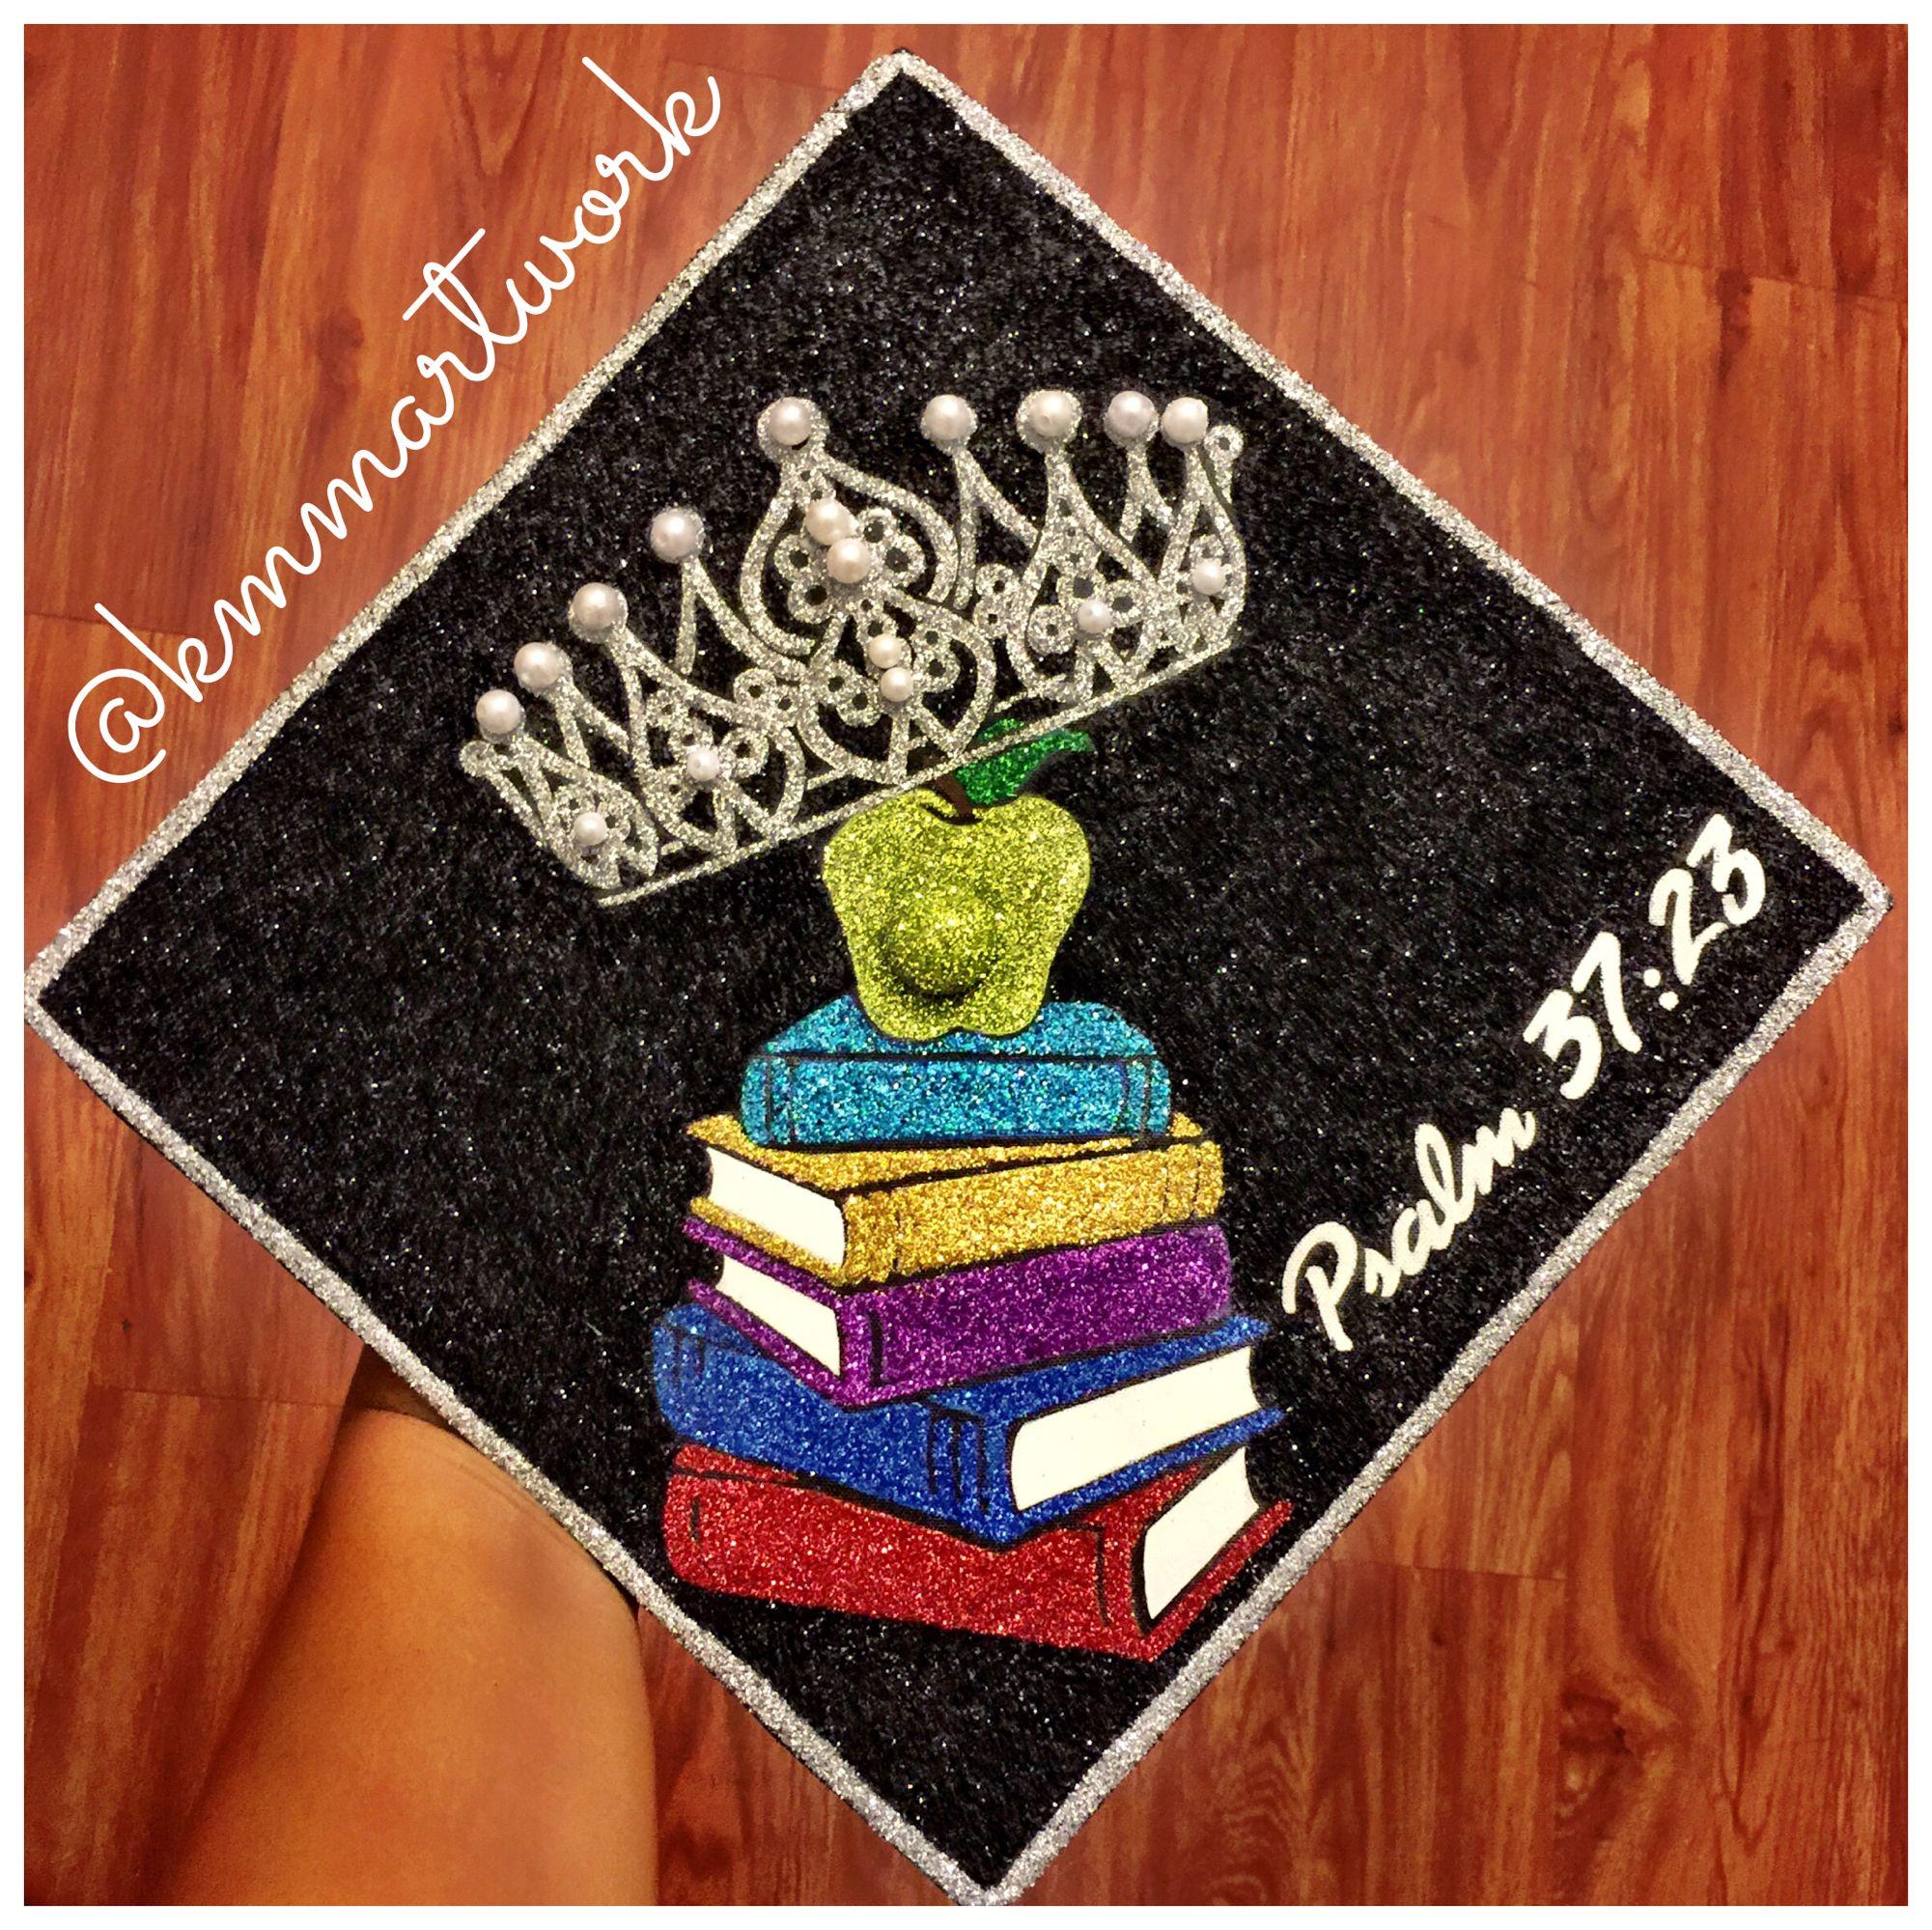 interior design ndsu - 1000+ images about Graduation ap <3 on Pinterest Graduation ...